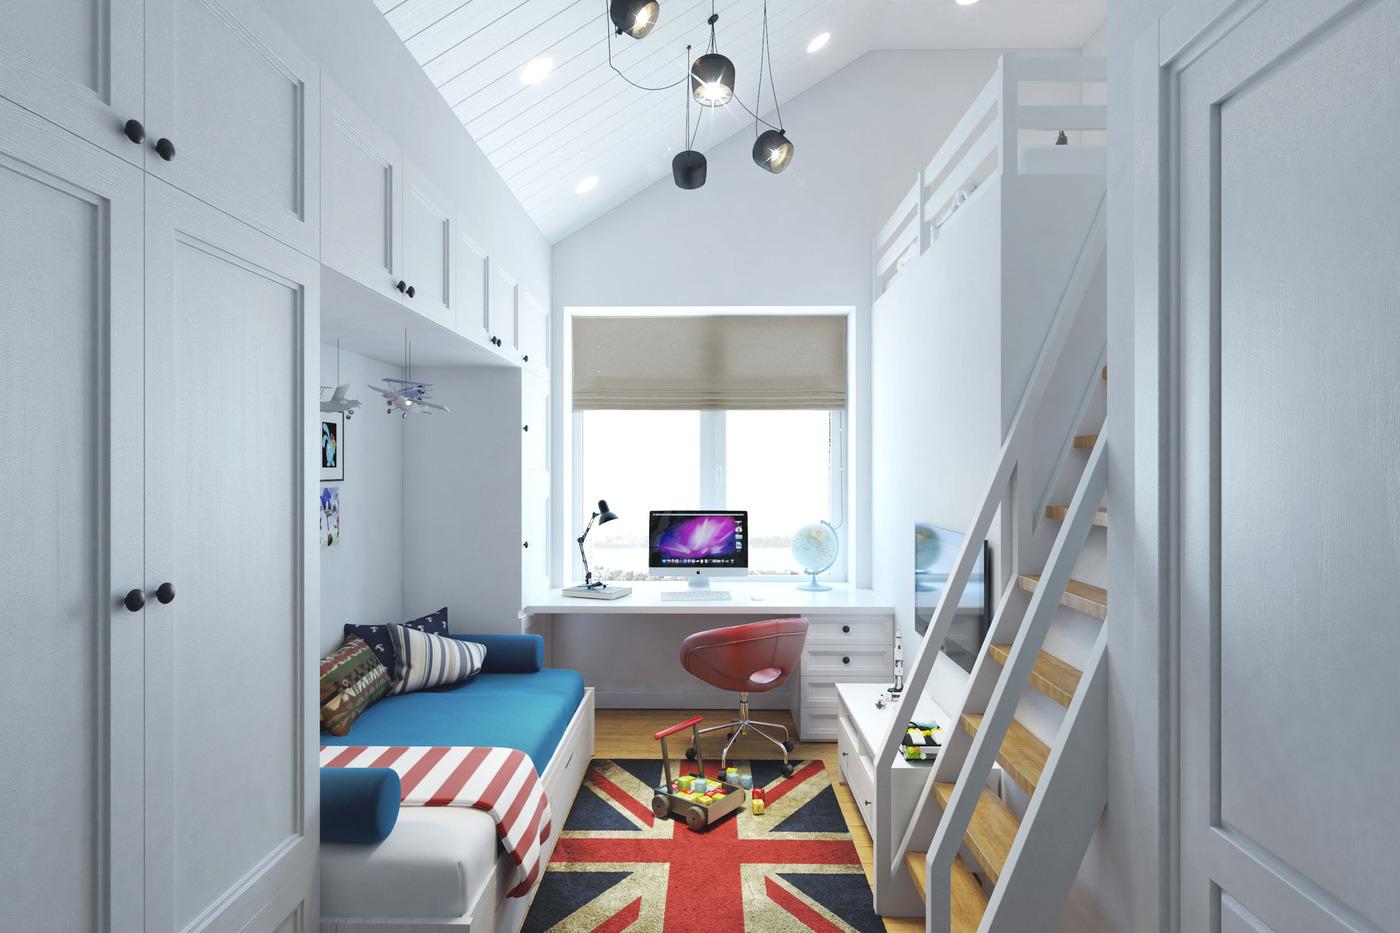 Small Teenage Room Design with a Second Floor Sleeping ... on Small Teen Bedroom Ideas  id=69964